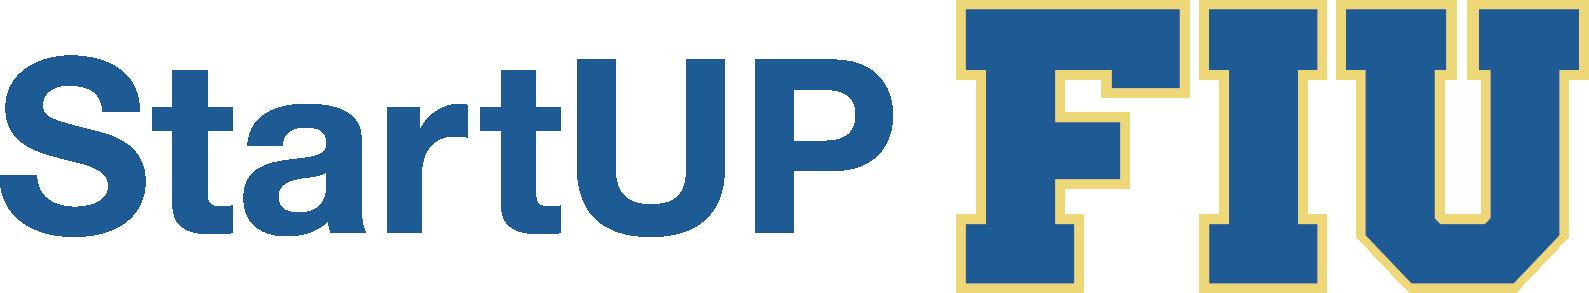 StartUp-FIU-hrz-Color.png